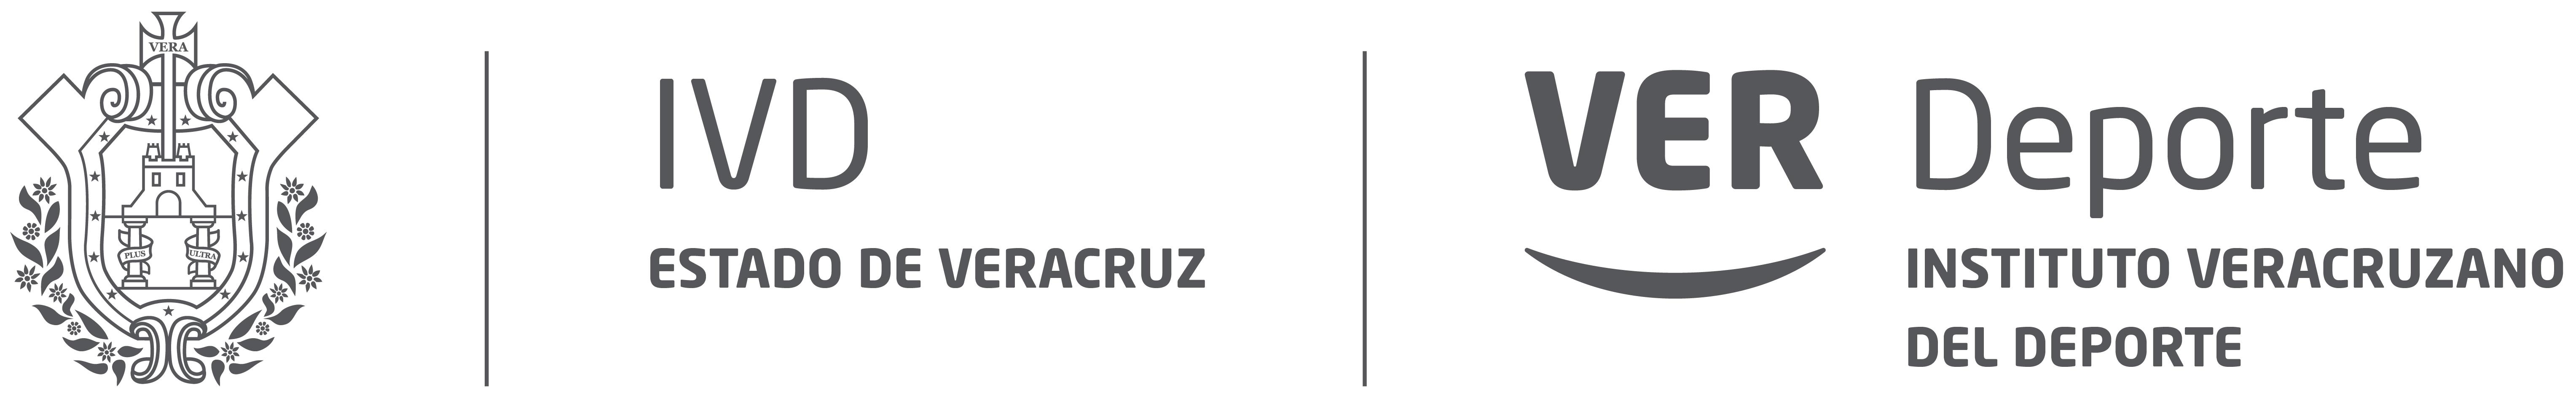 IVD Estado de Veracruz-01